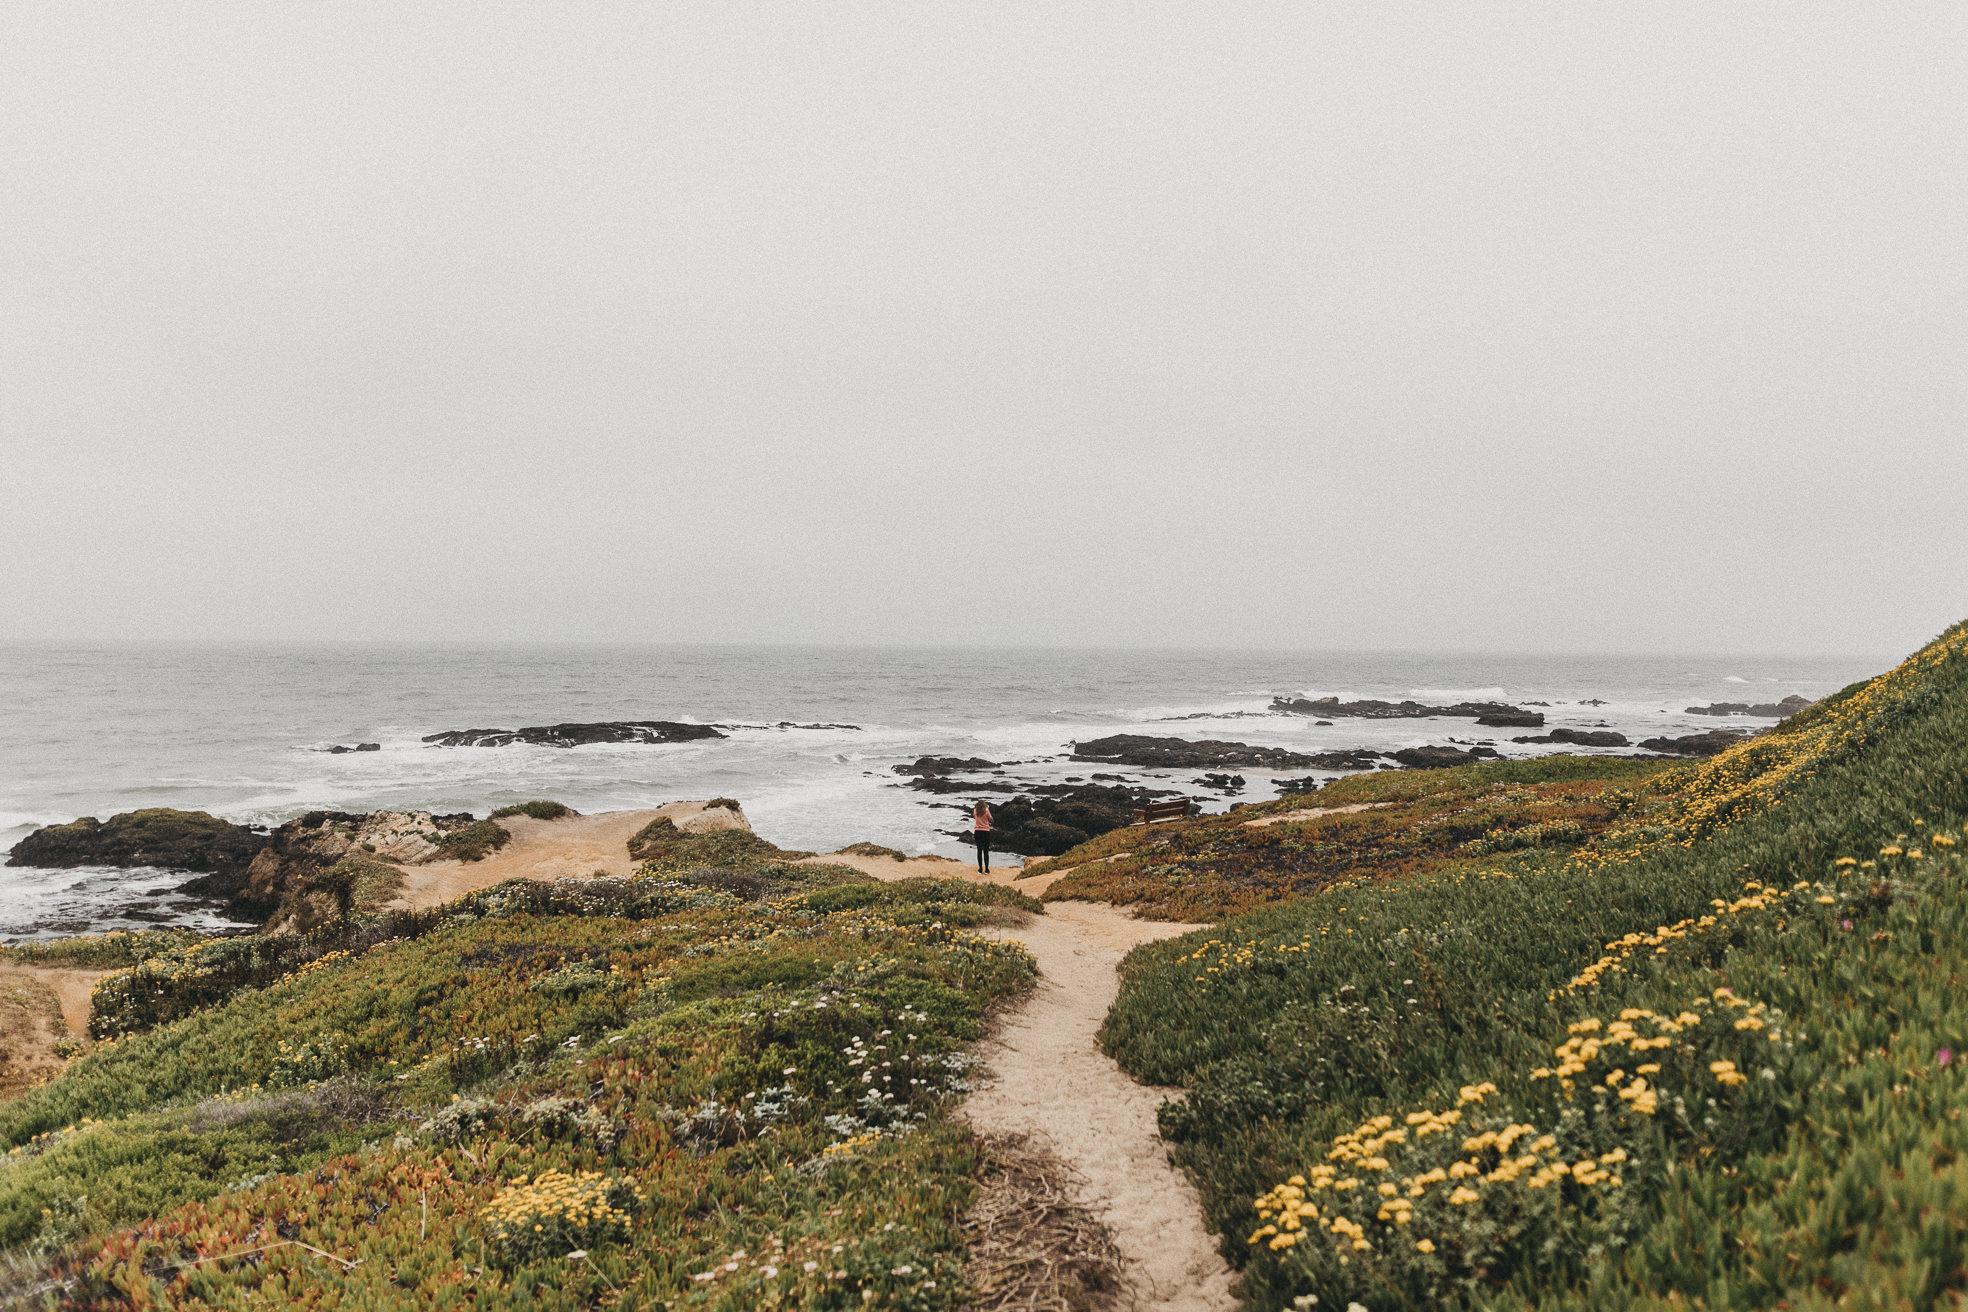 San-Francisco-BildervomLeben-9912